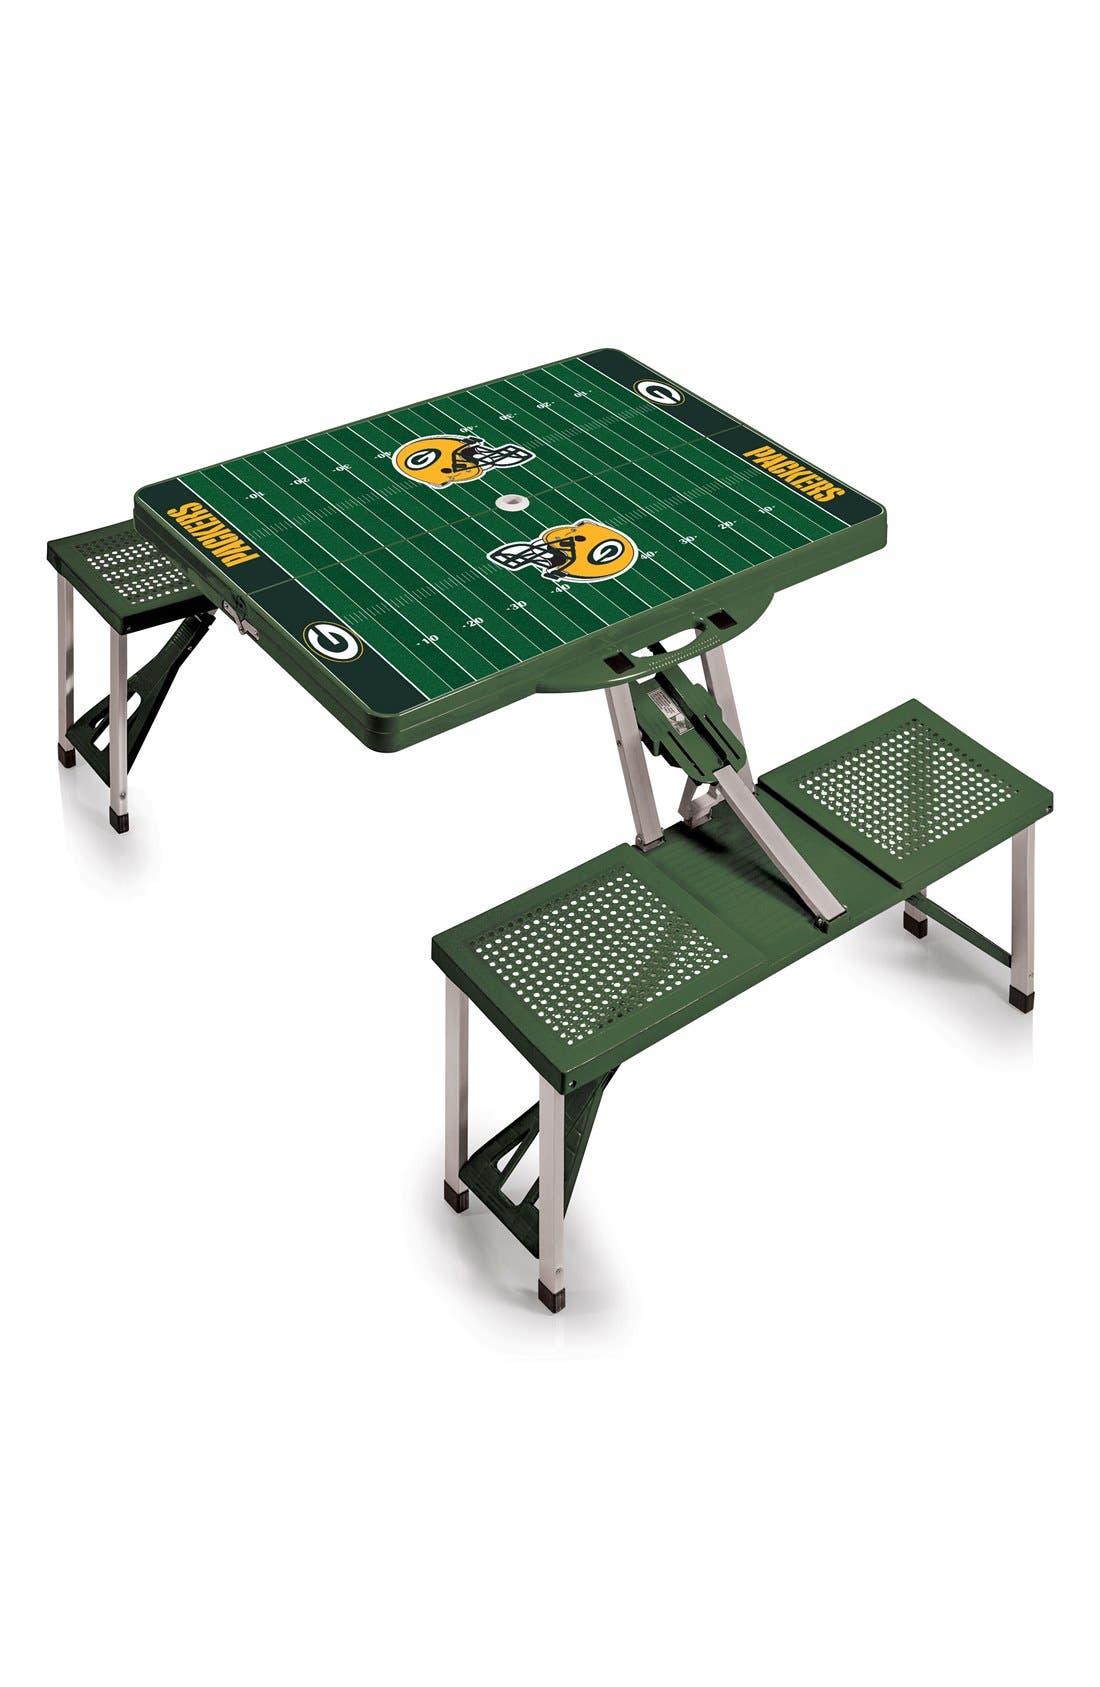 Picnic Time Team Football Field Design Portable Picnic Table